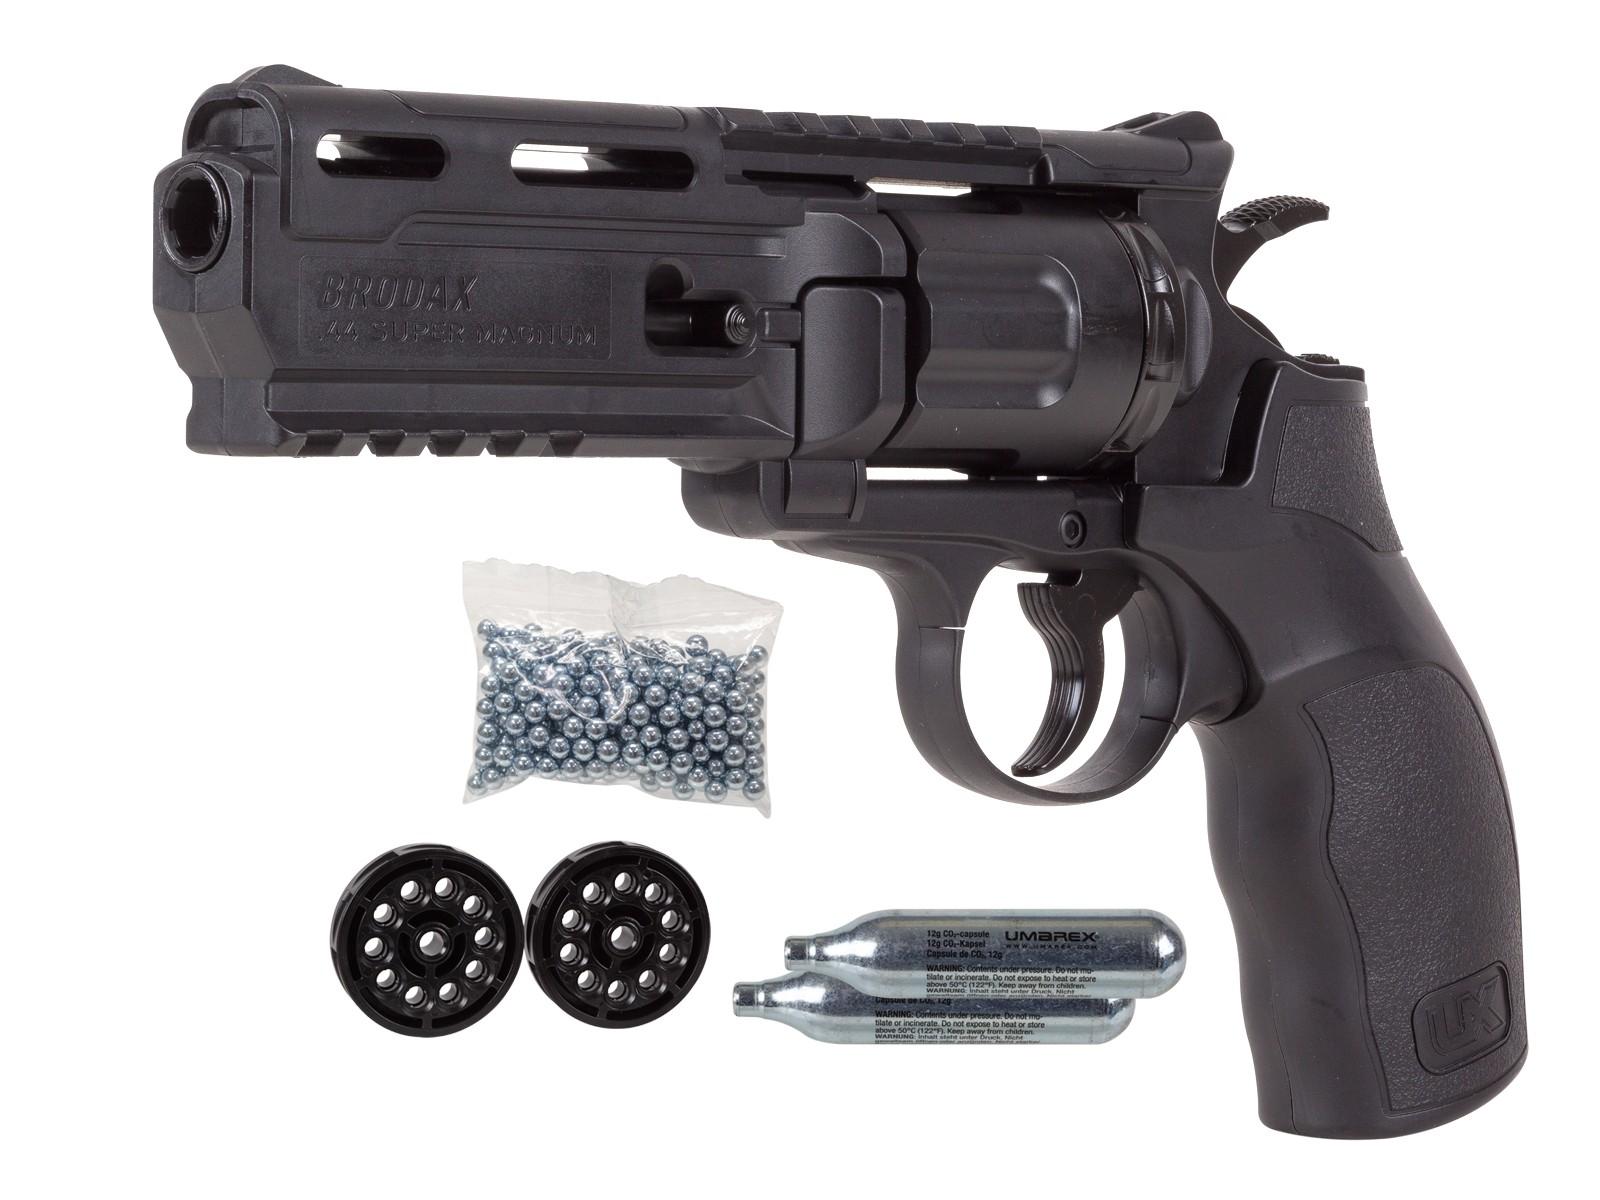 Umarex Brodax Pistol.